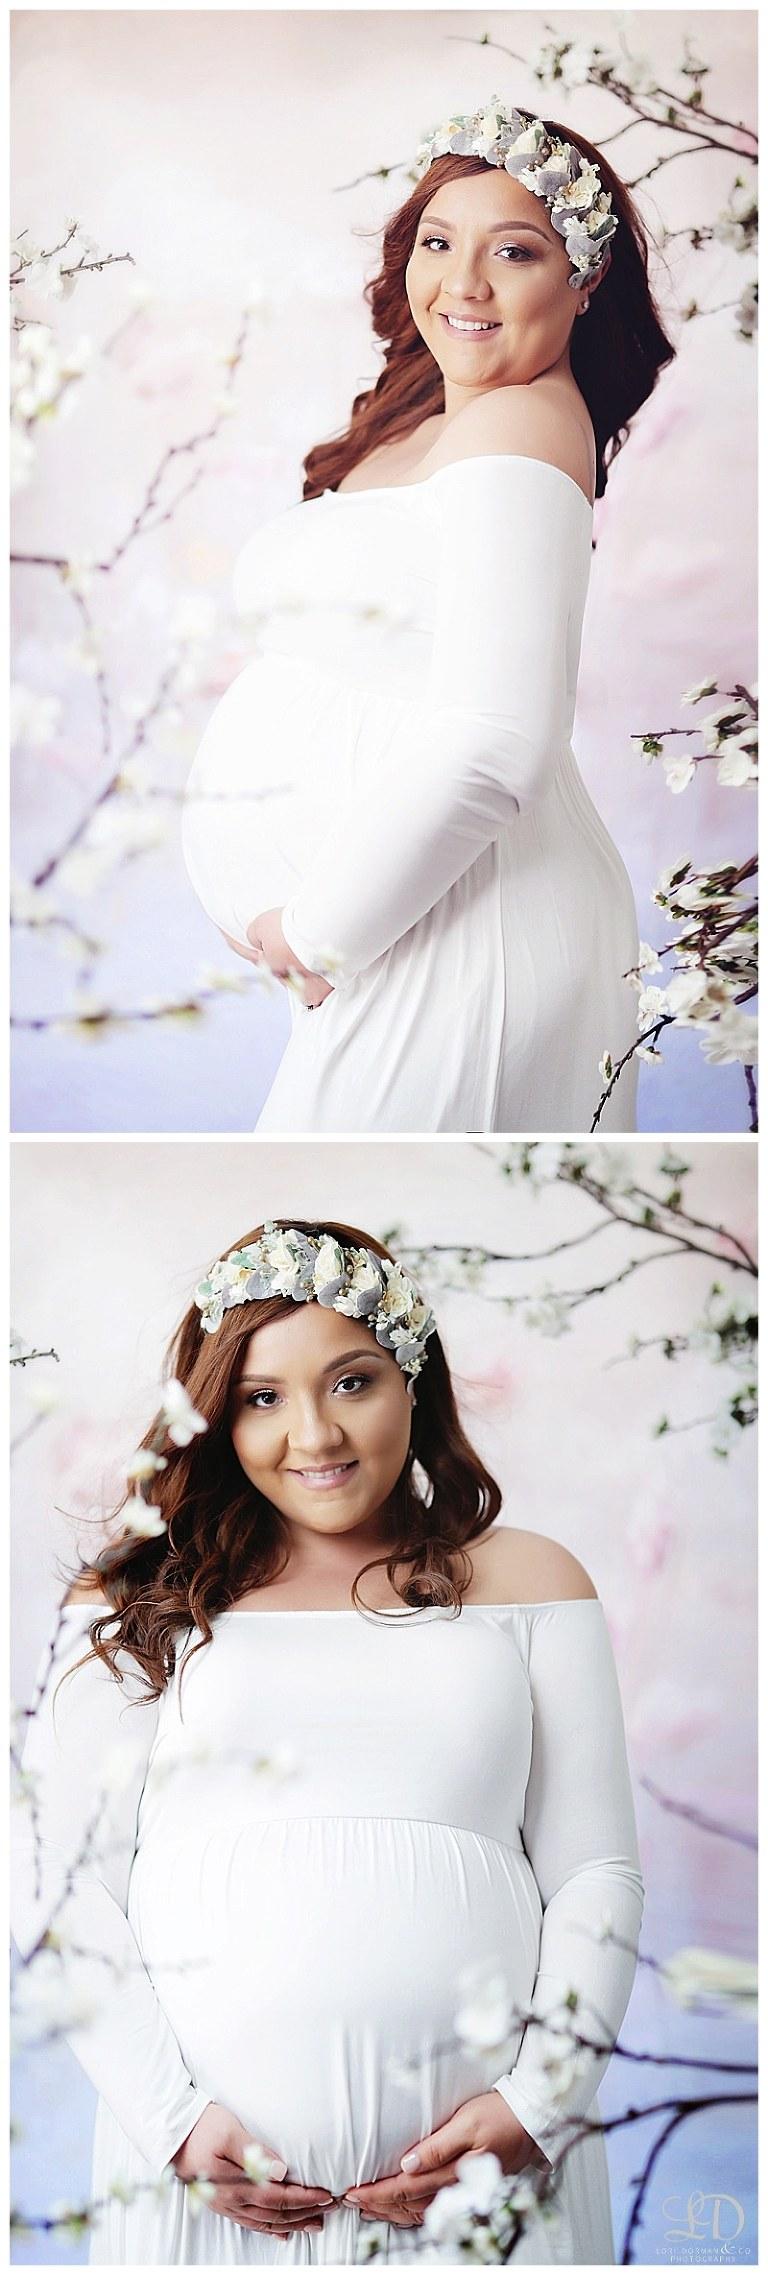 sweet maternity photoshoot-lori dorman photography-maternity boudoir-professional photographer_5715.jpg